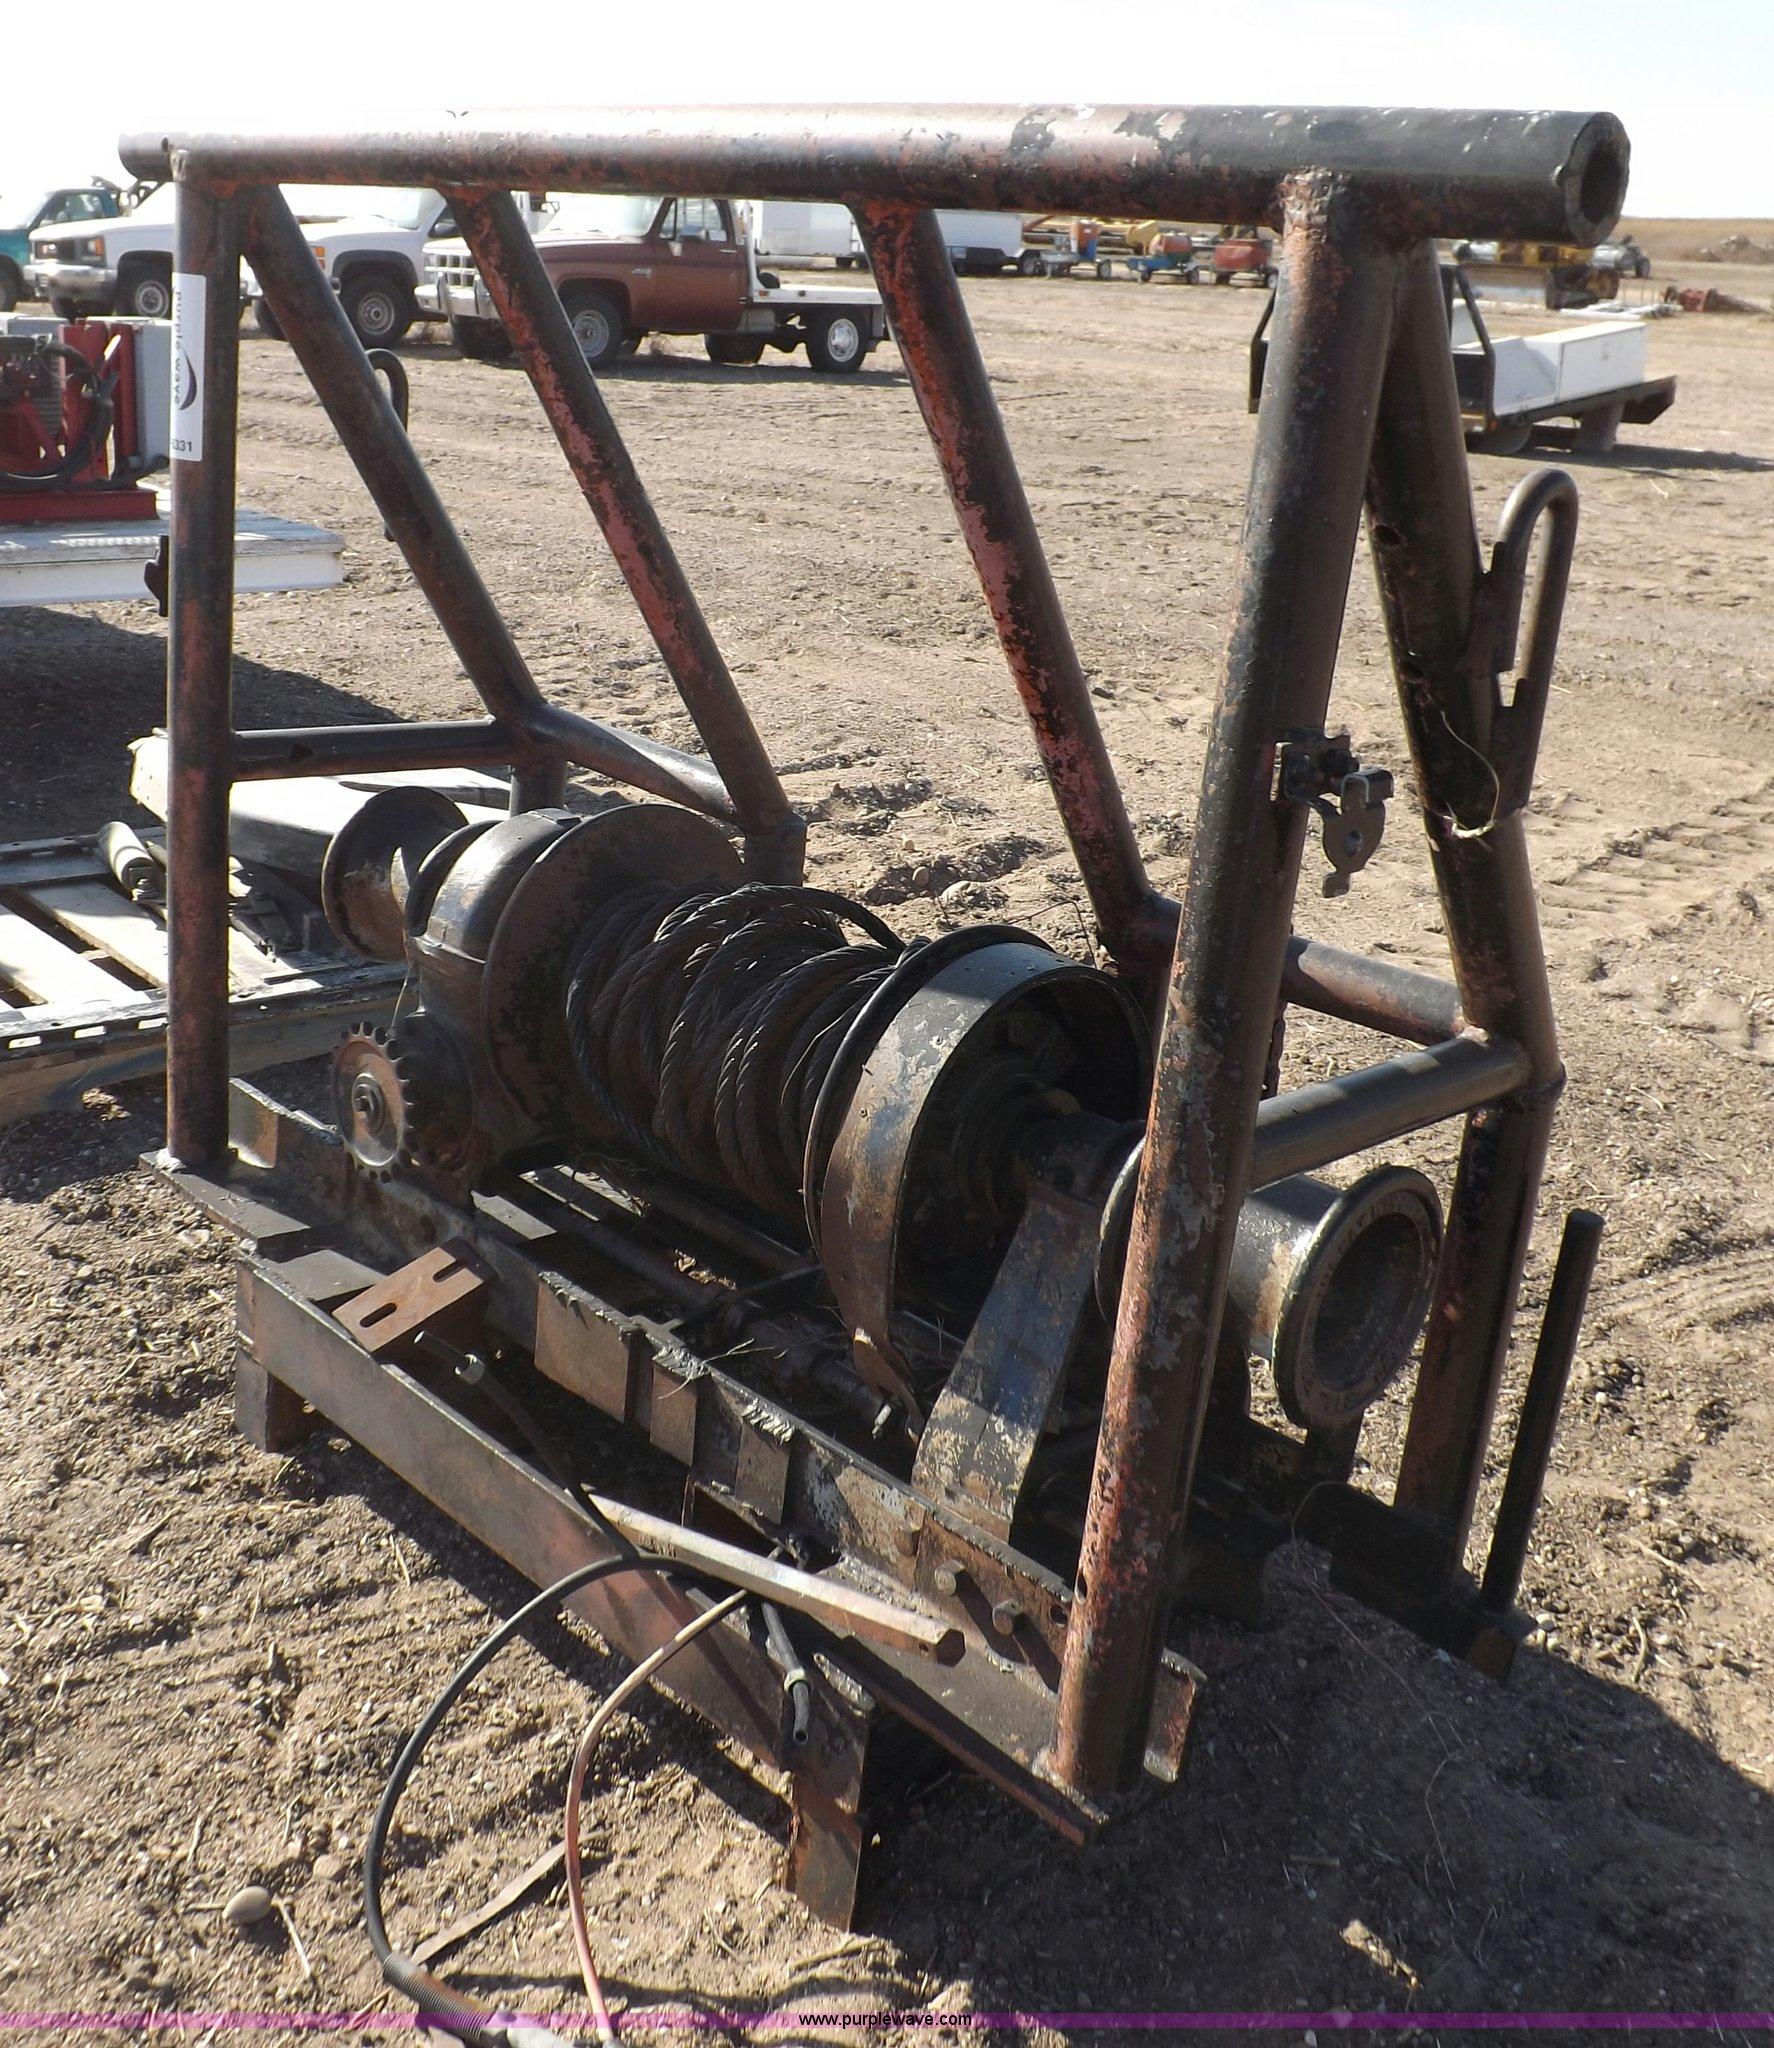 Tulsa 34L winch with headache rack | Item F6331 | SOLD! Wedn